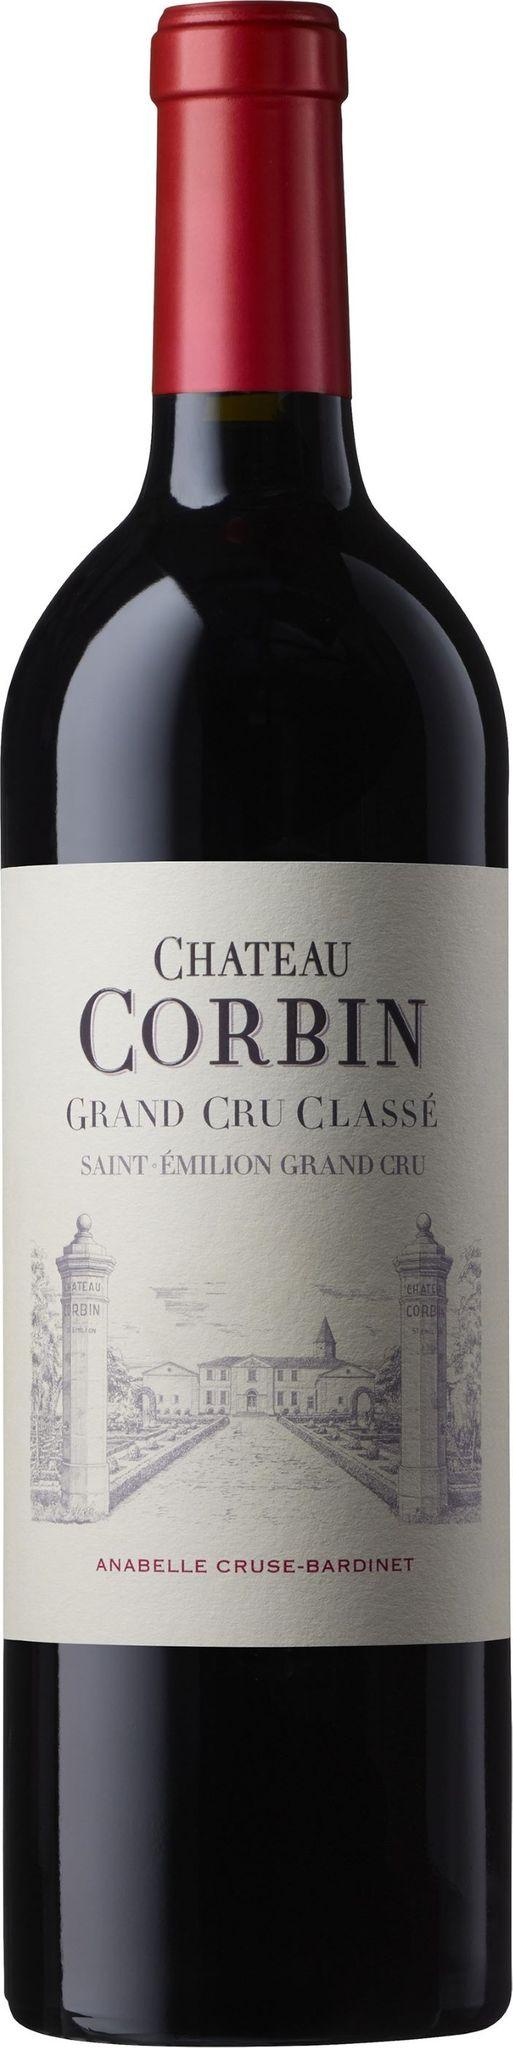 Produktbild på Château Corbin